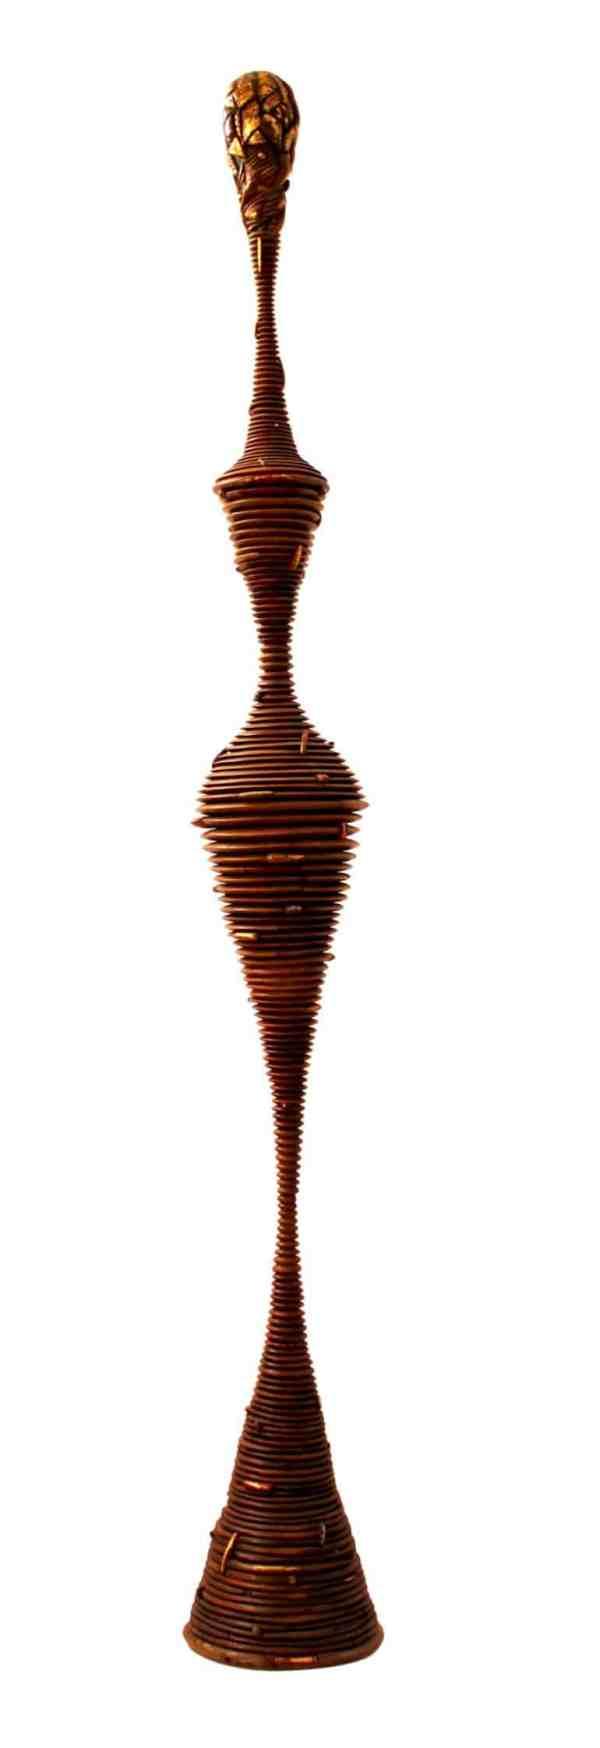 """Figure"" - Original Artwork by Roberto Yonkov"